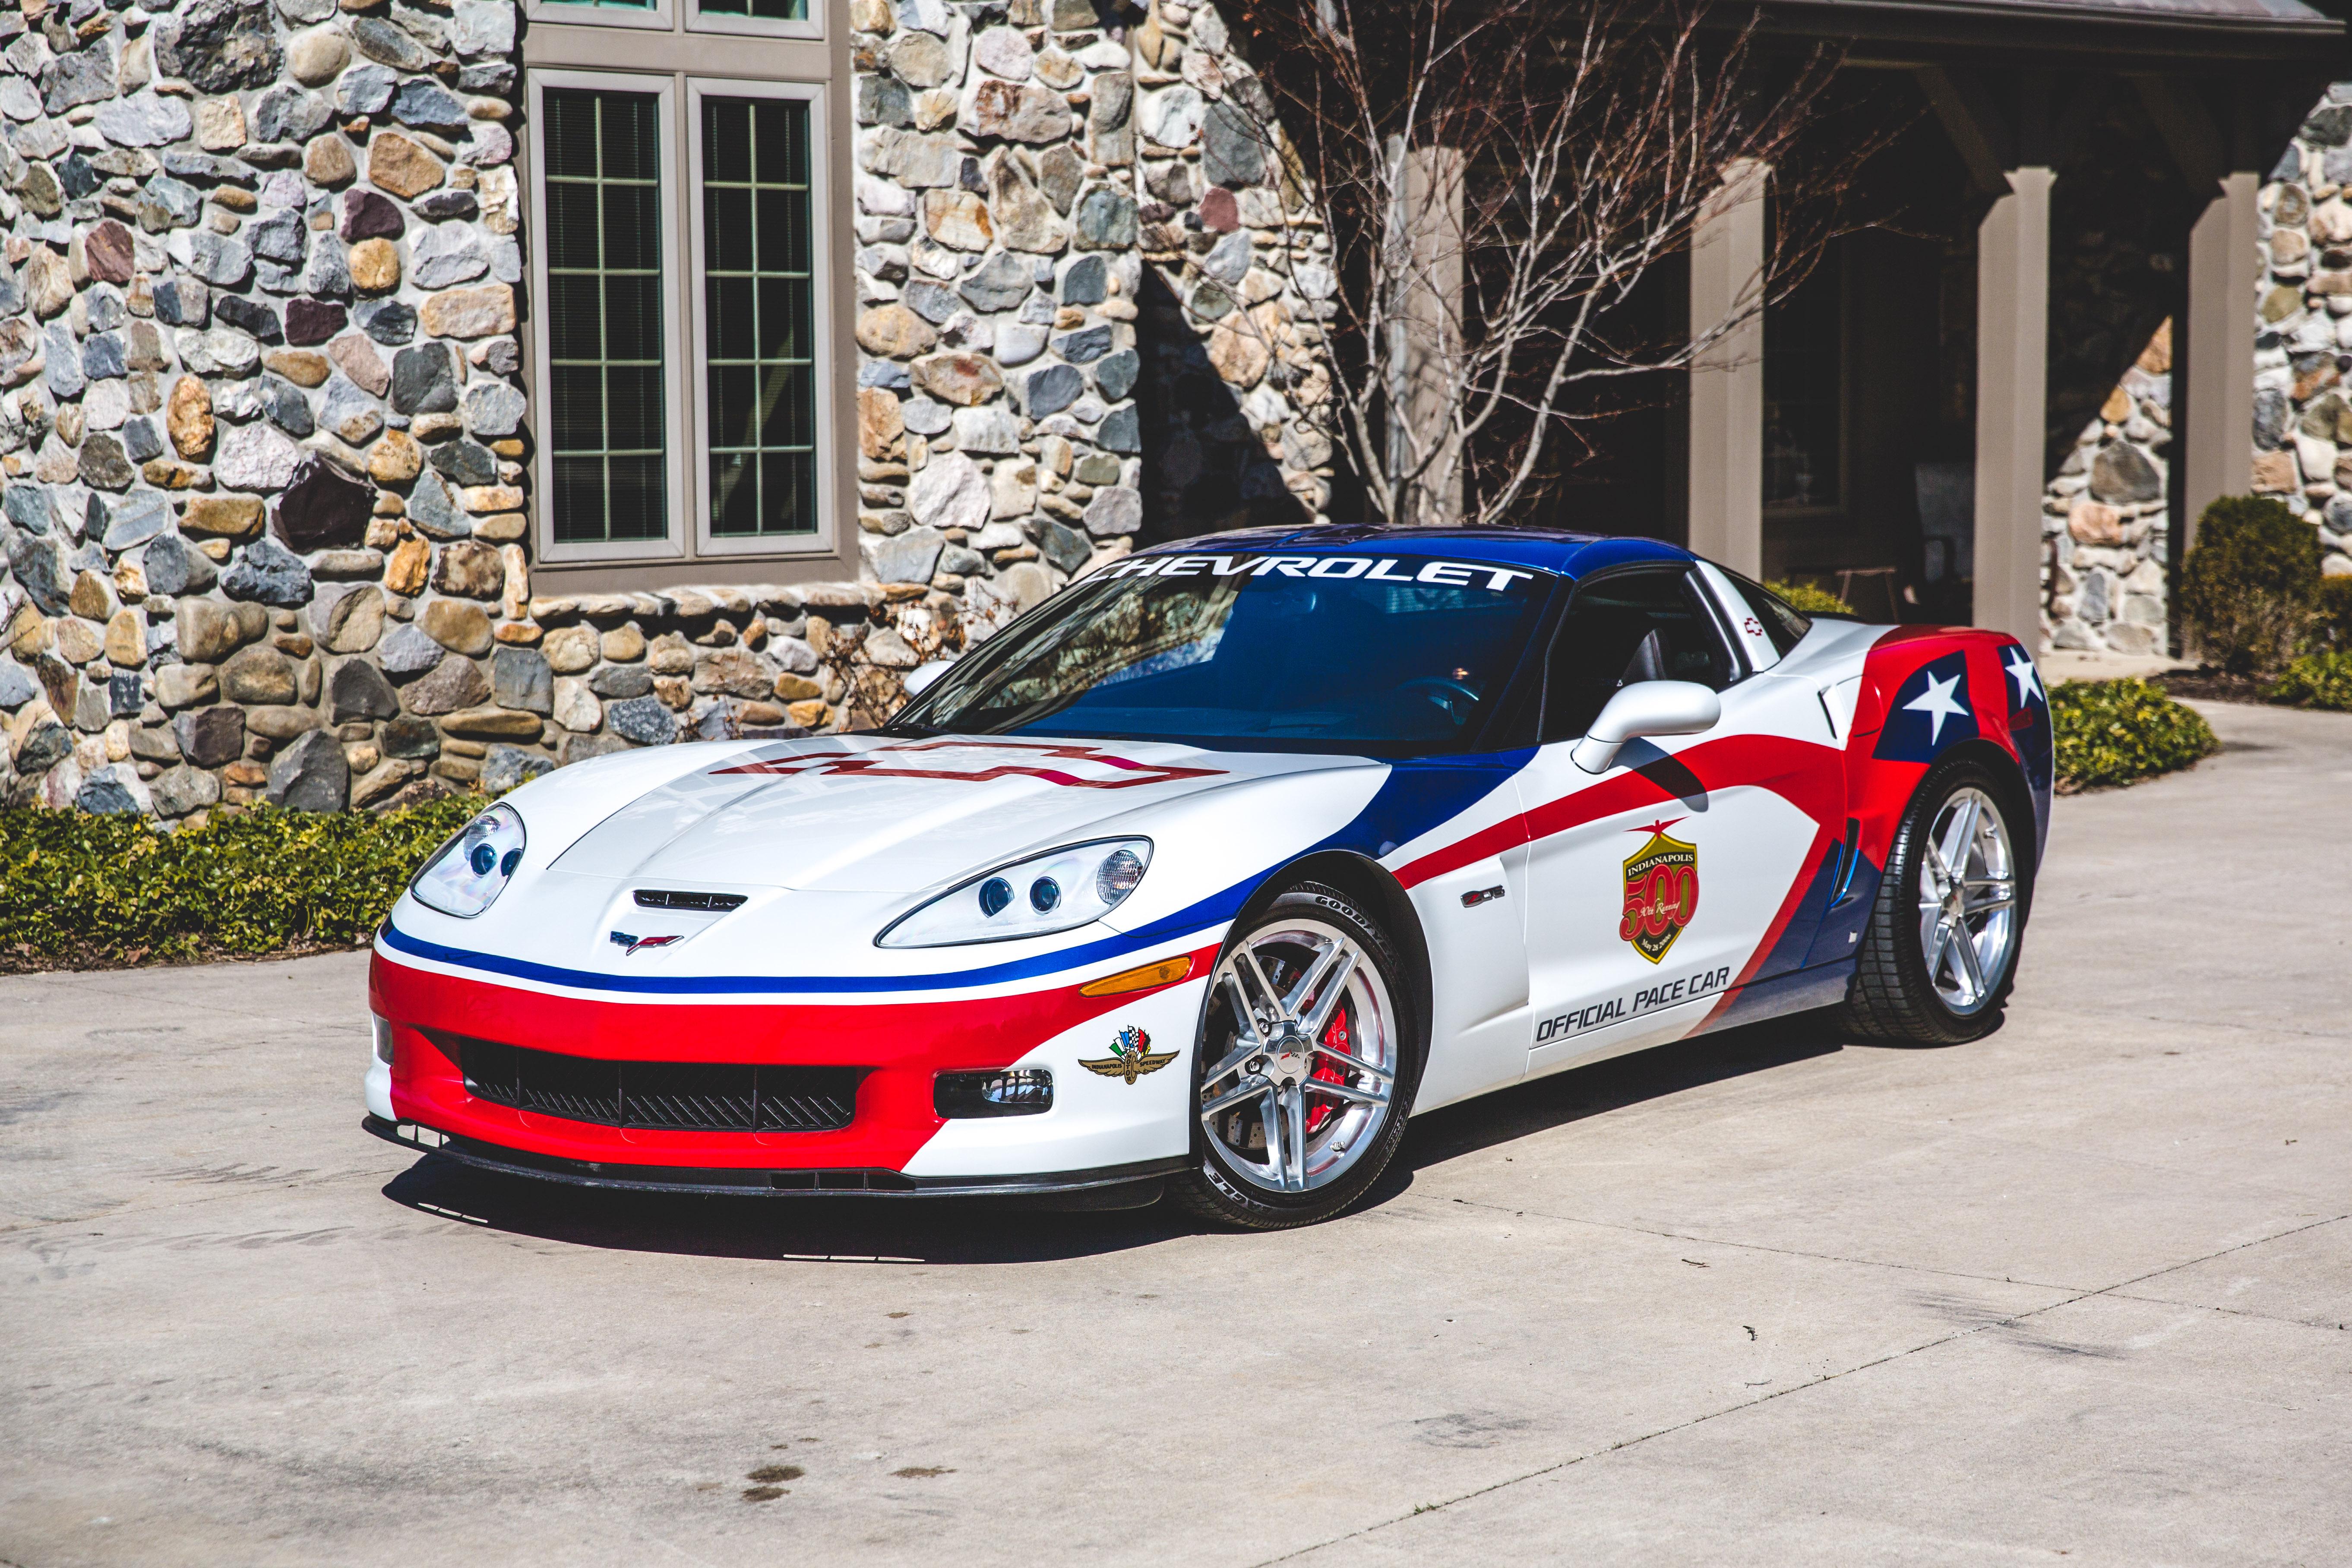 Corvette, Indy pace car collection on Mecum docket, ClassicCars.com Journal